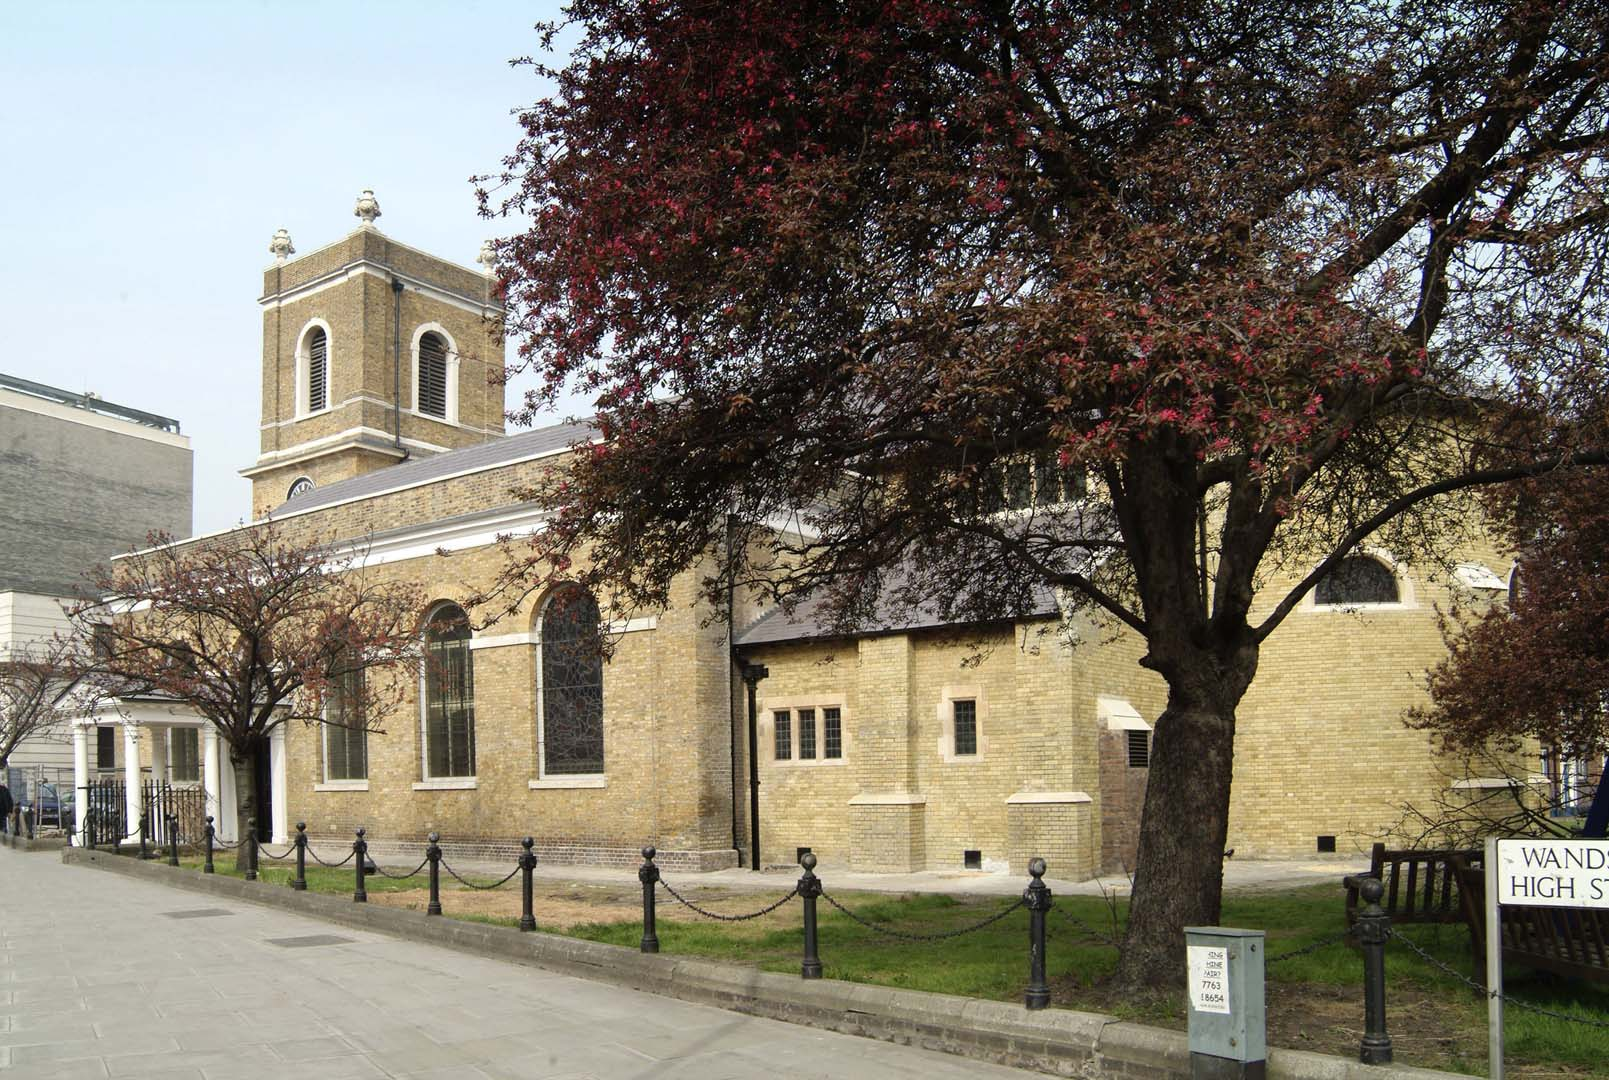 All Saints Church, Wandsworth